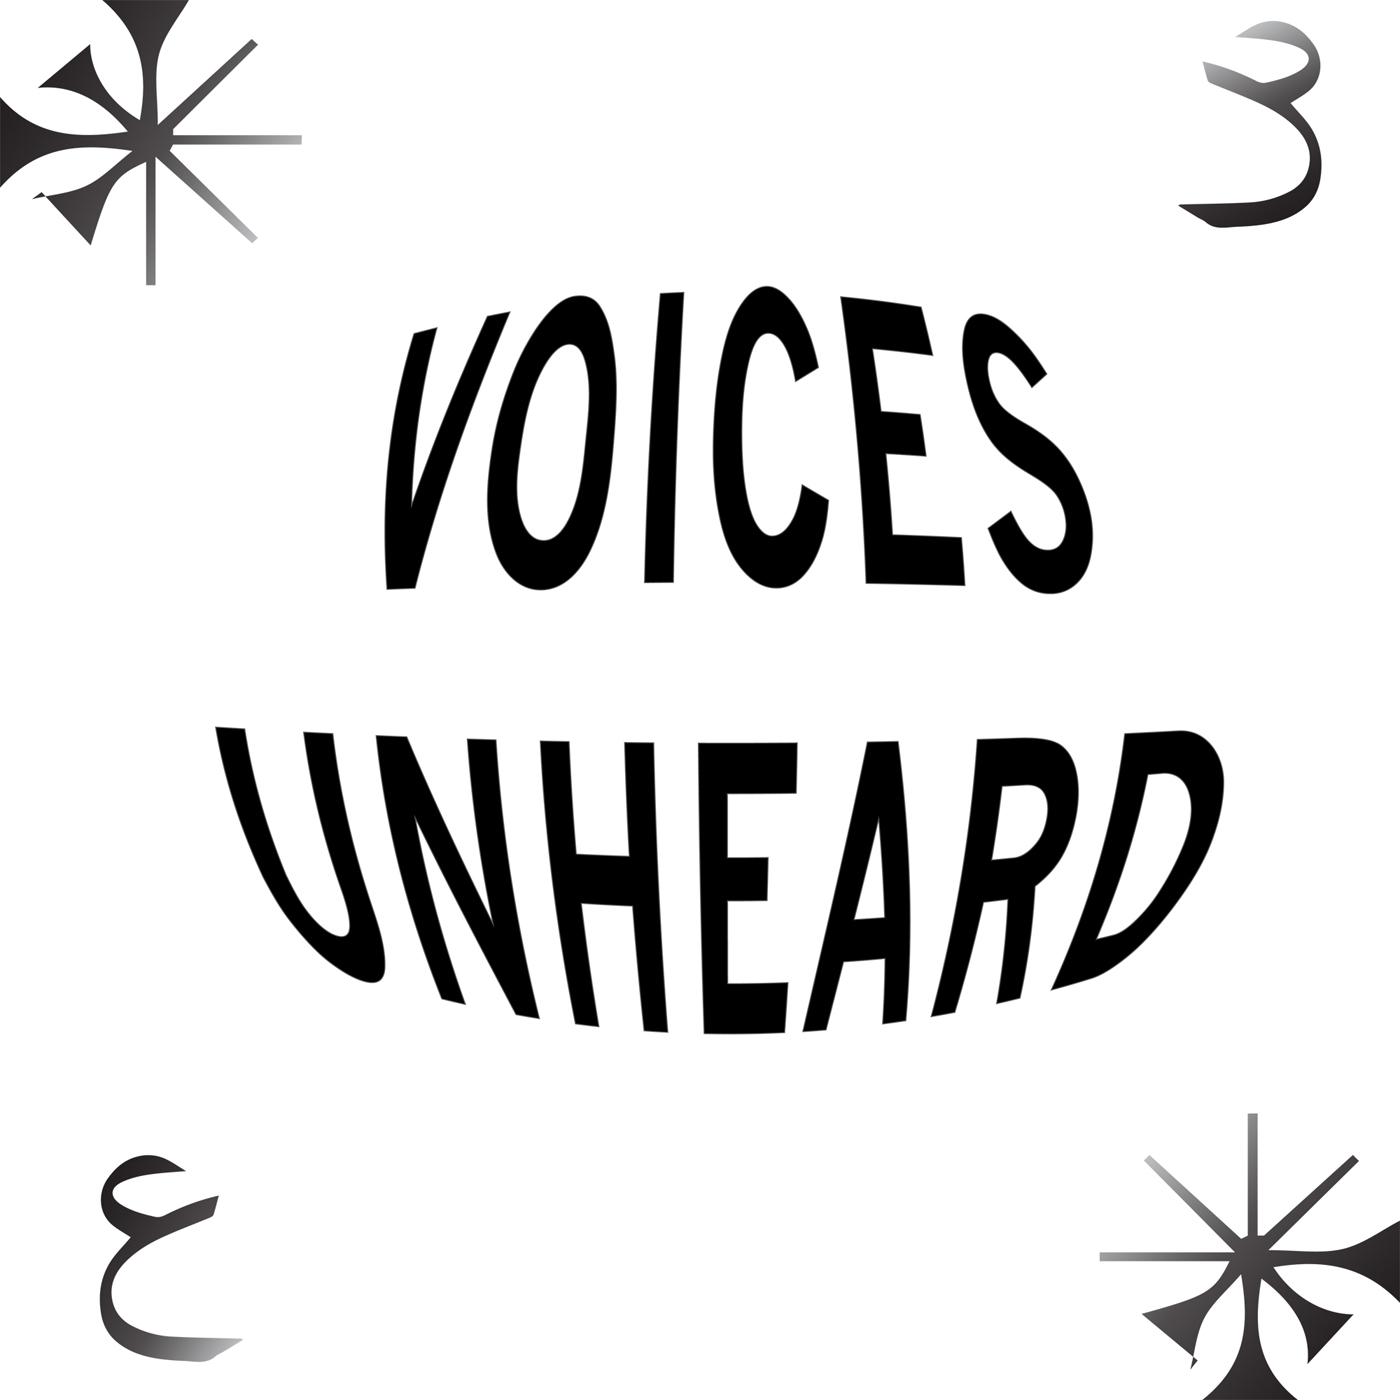 Voices Unheard - Rasha Elass